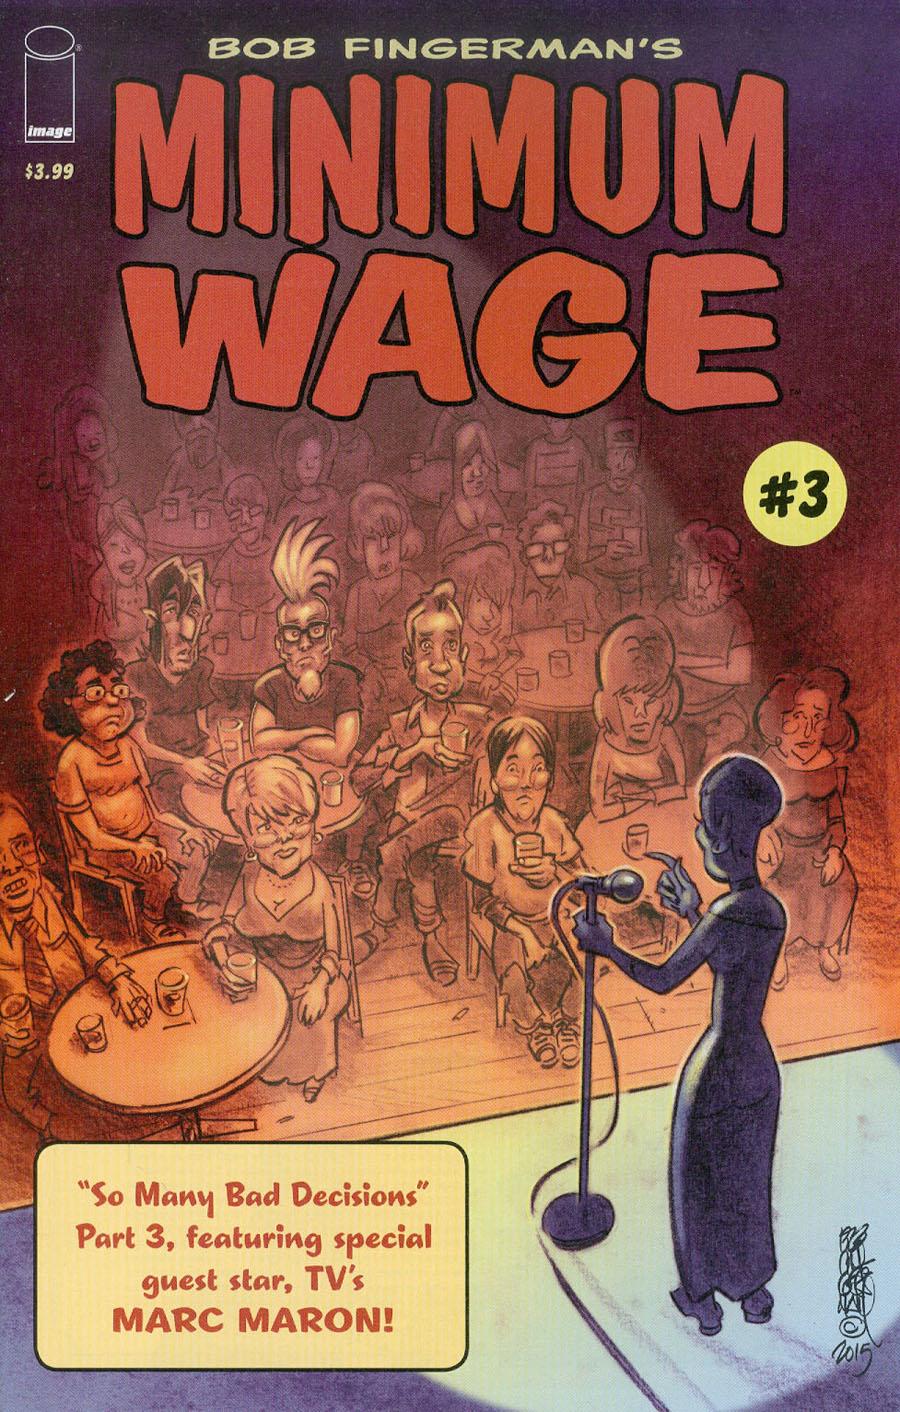 Minimum Wage So Many Bad Decisions #3